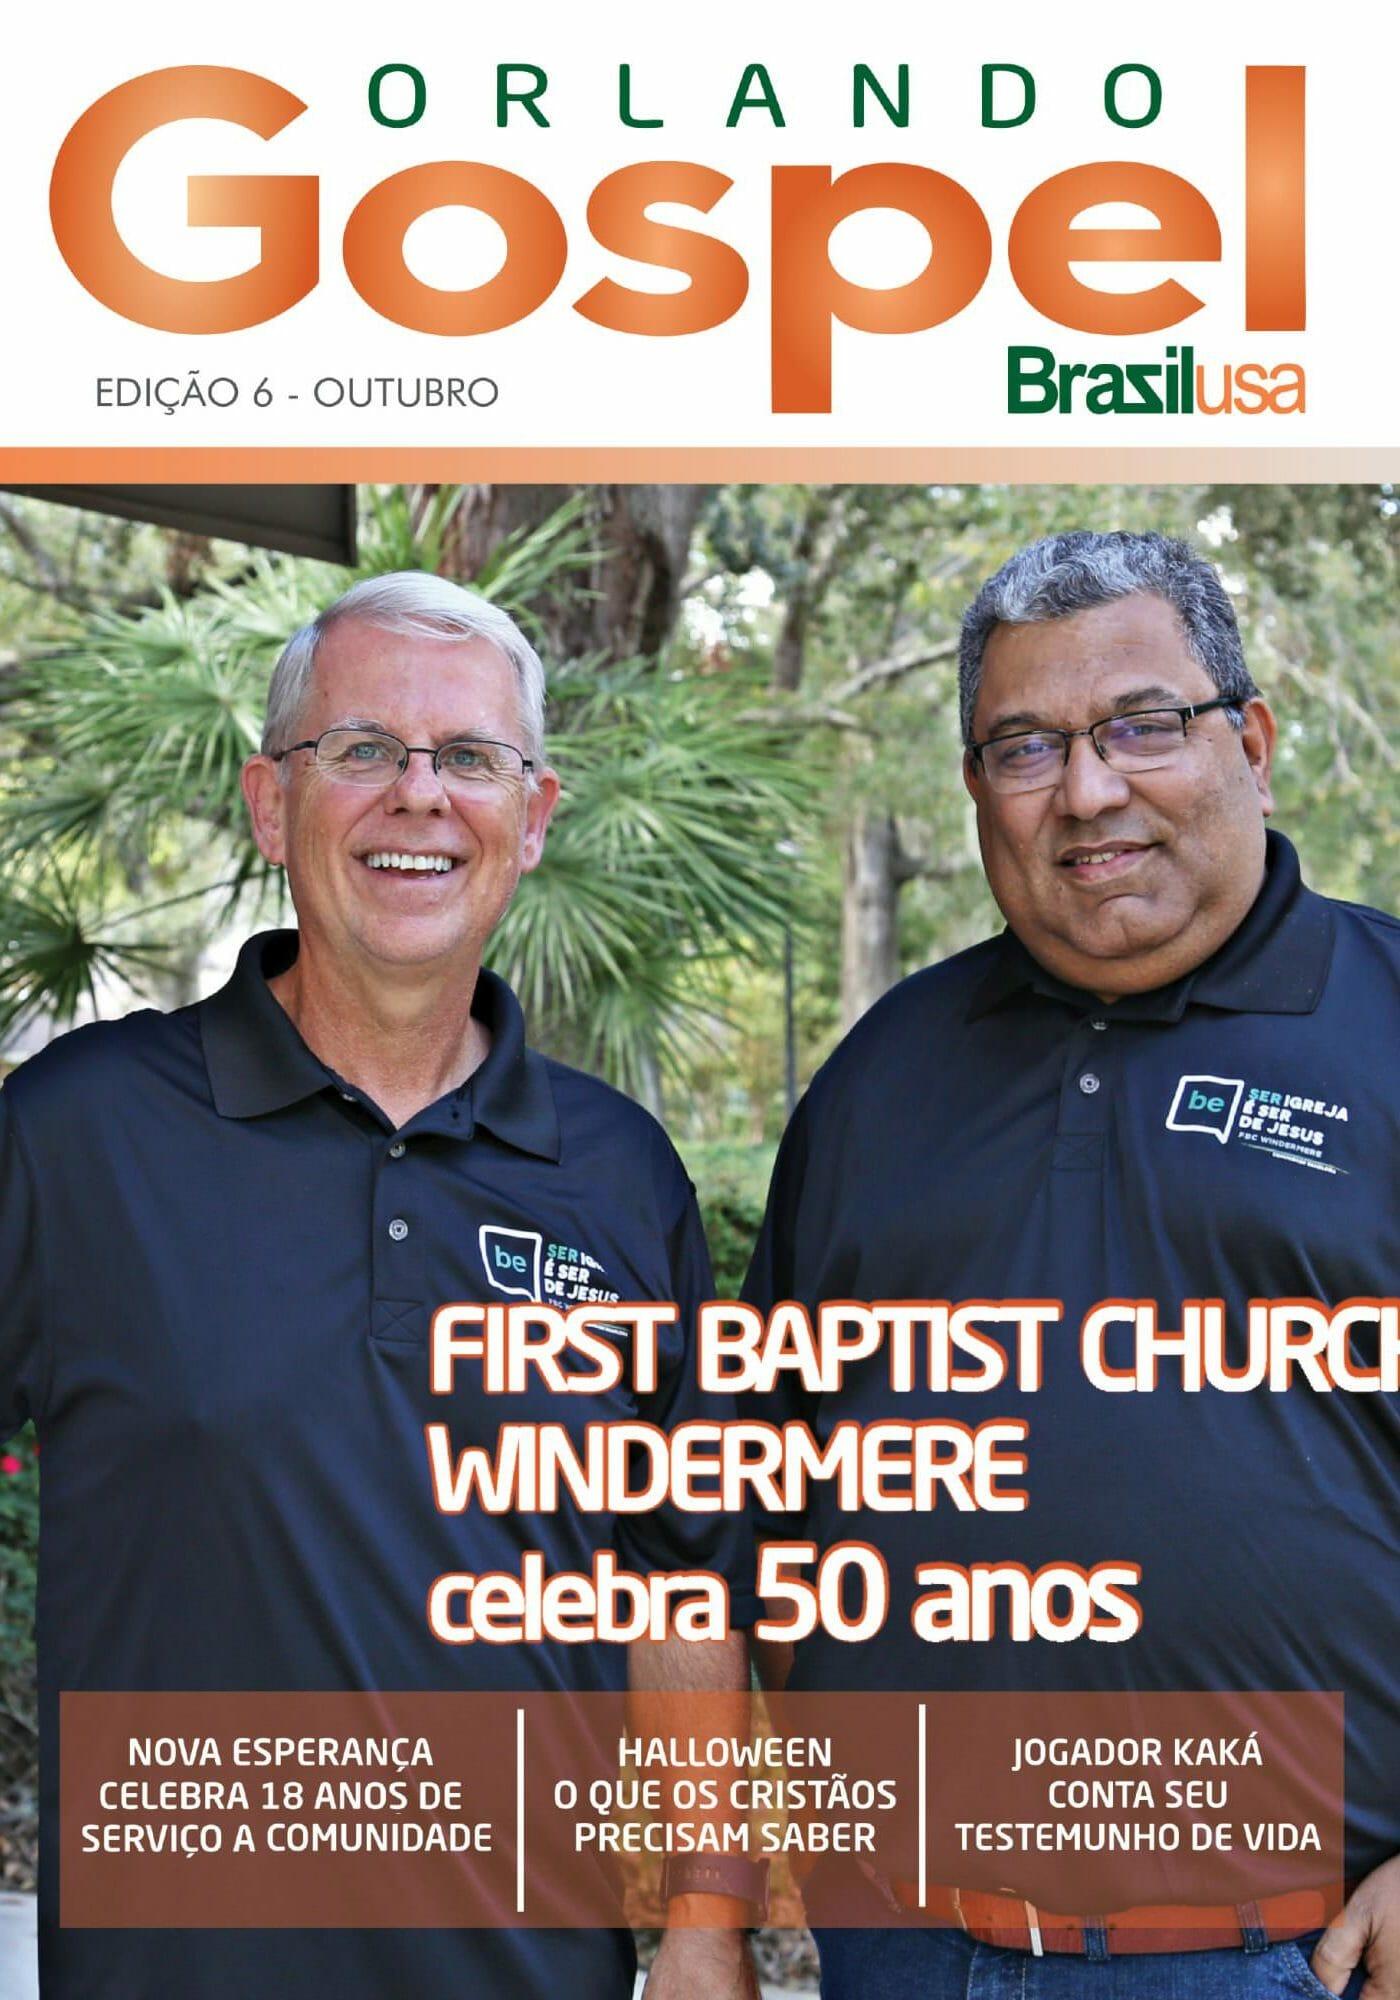 Orlando Gospel ed 06